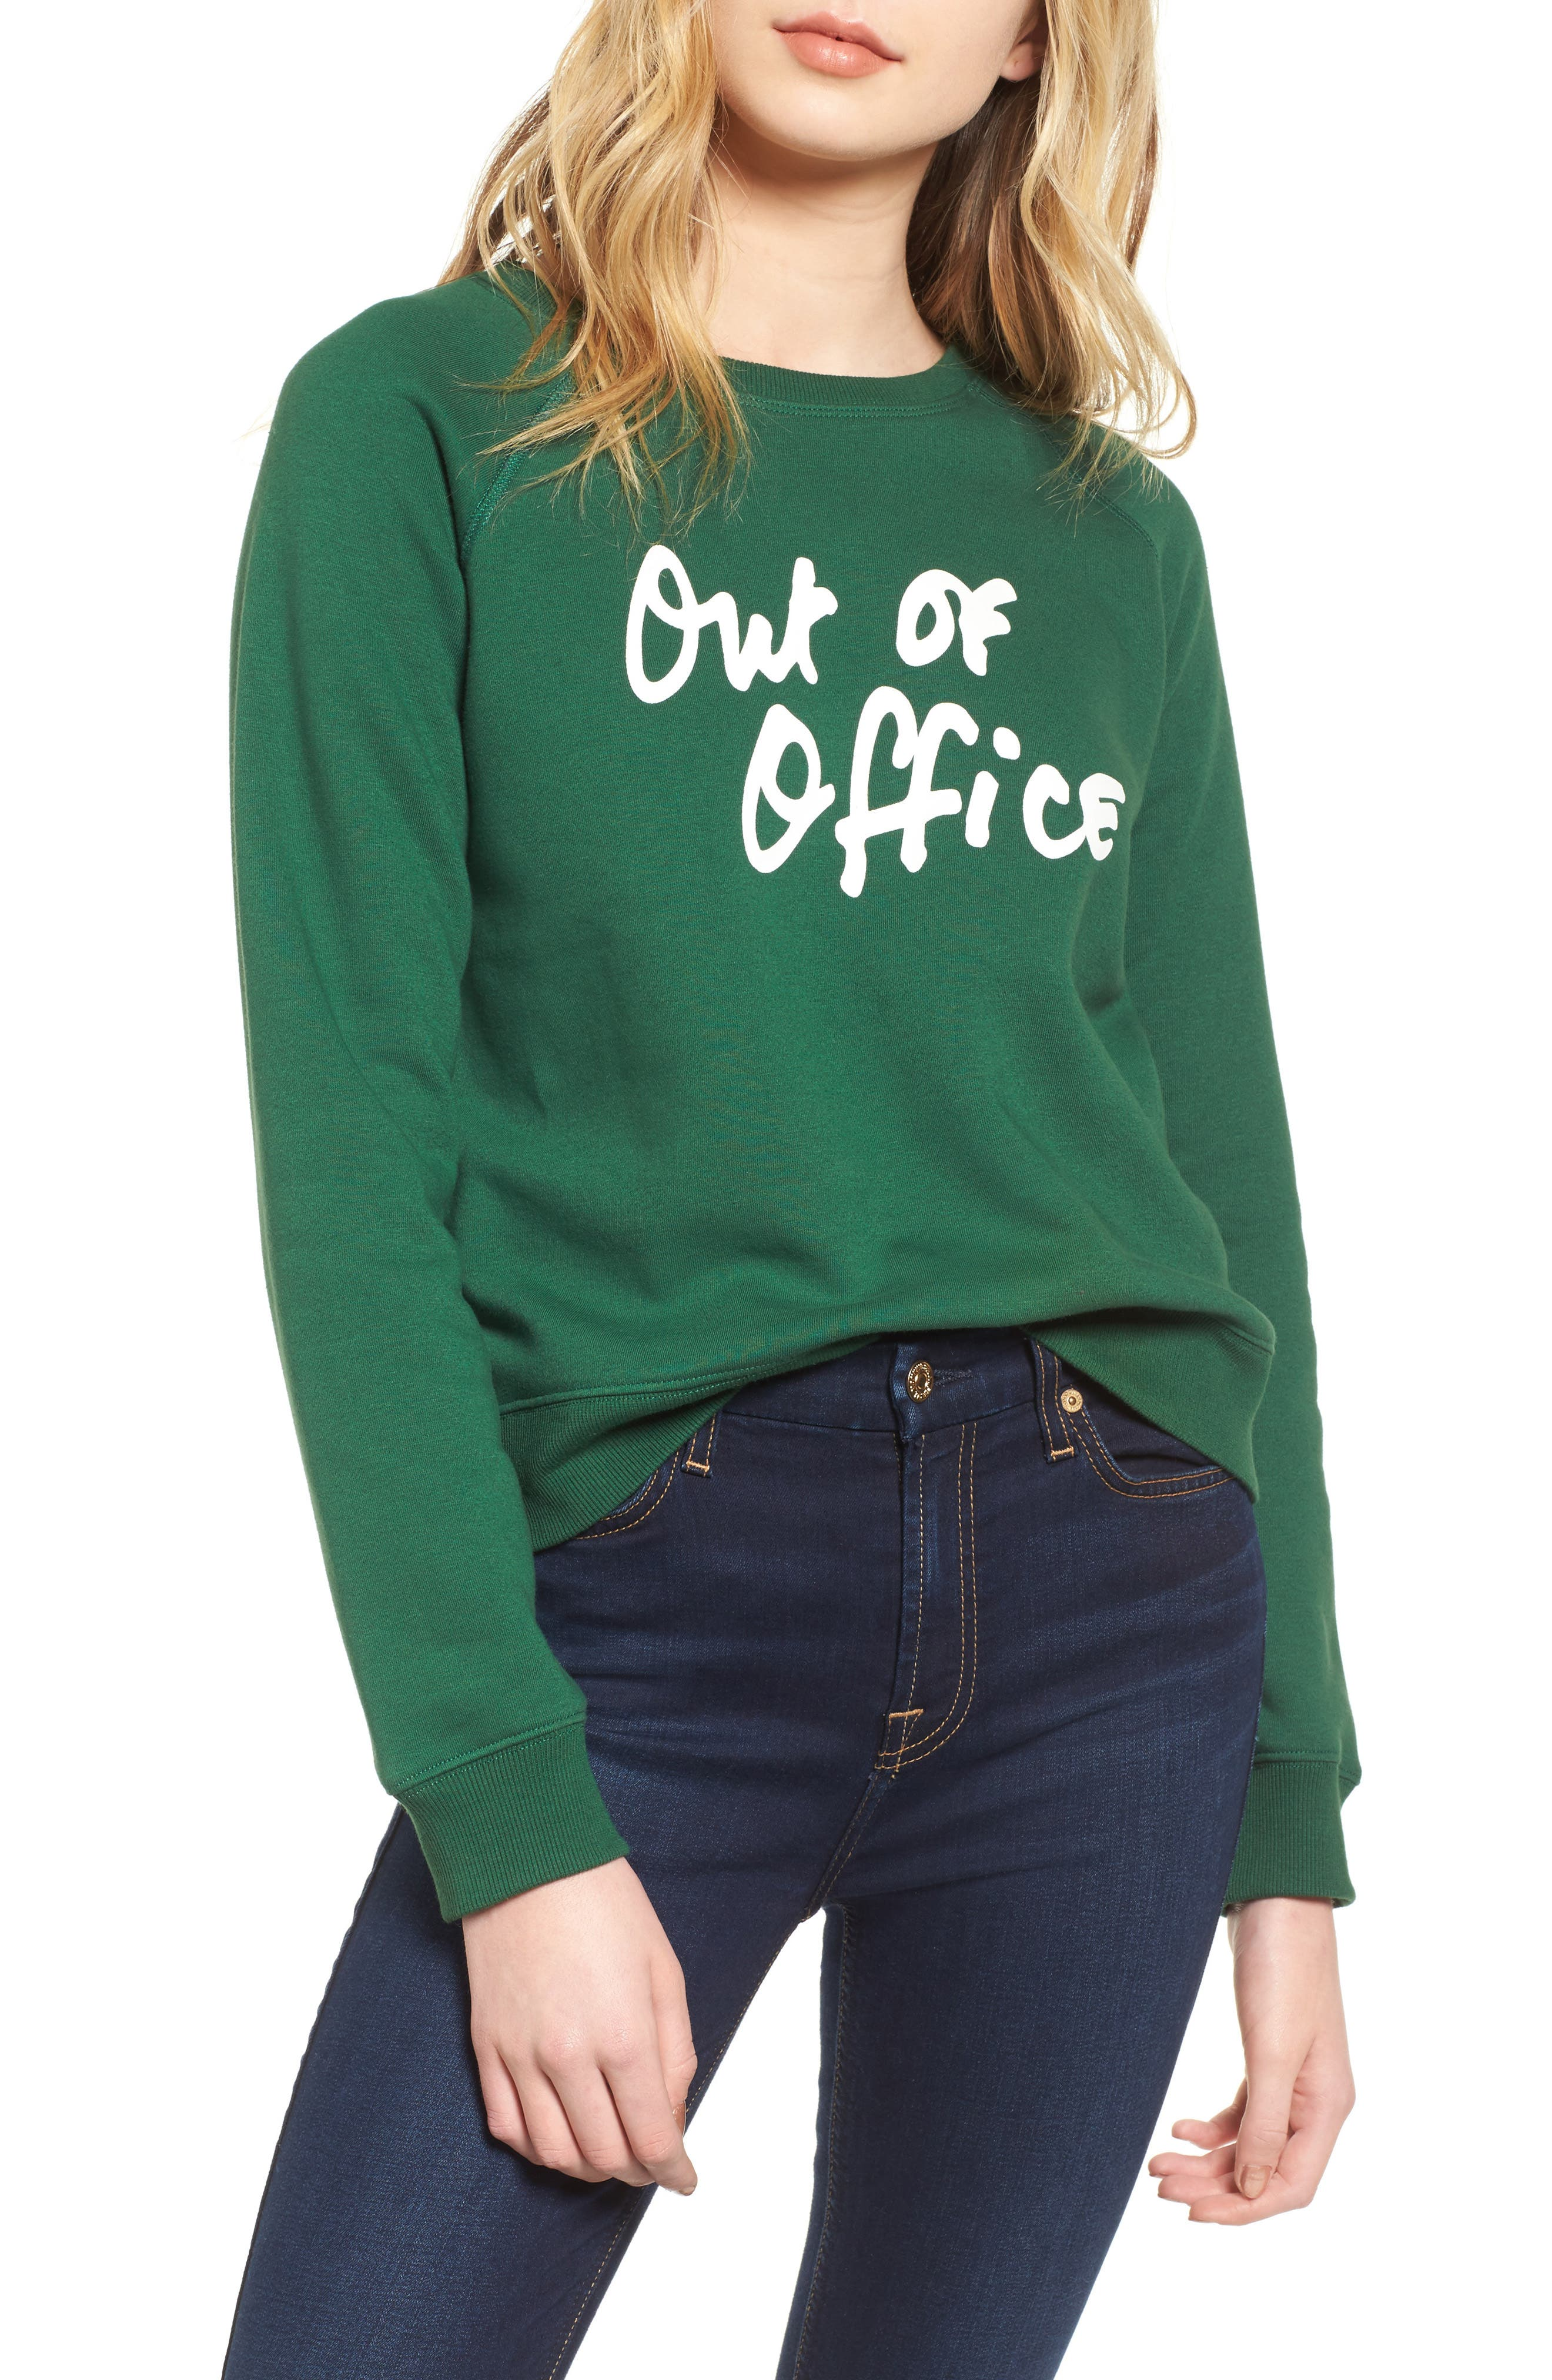 Main Image - Rebecca Minkoff Out of Office Sweatshirt